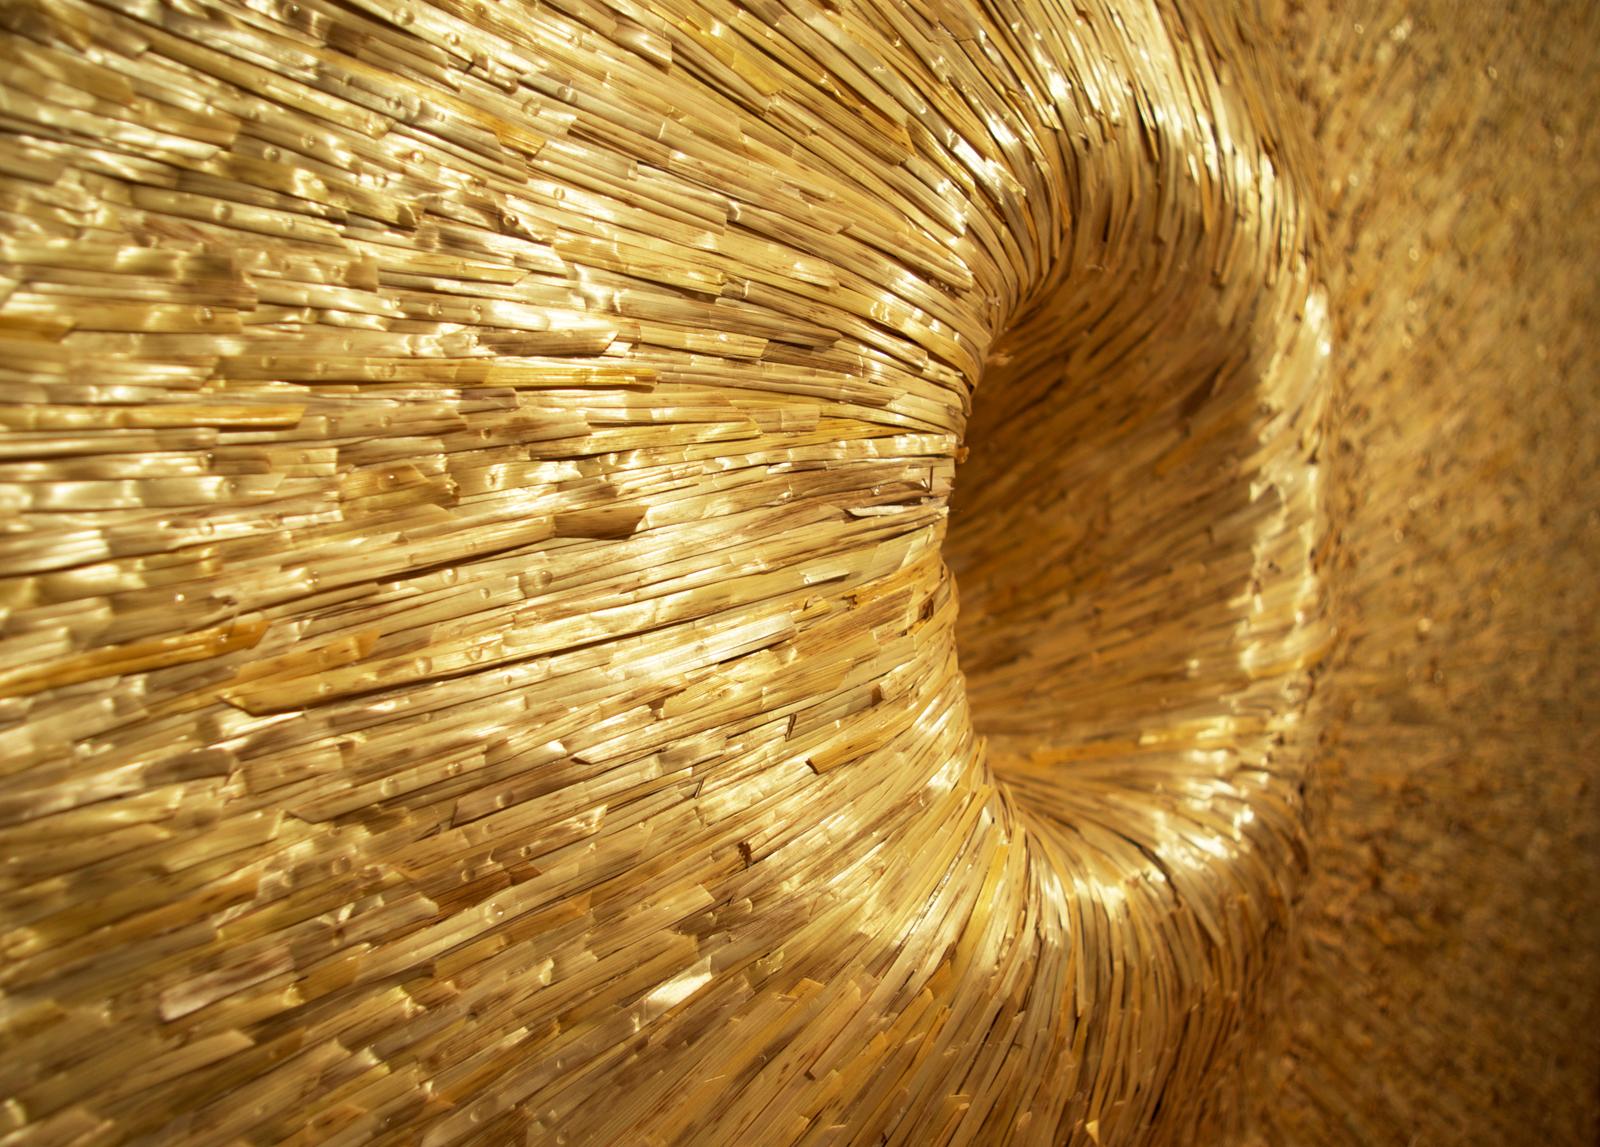 shea-hembrey-radius-detail